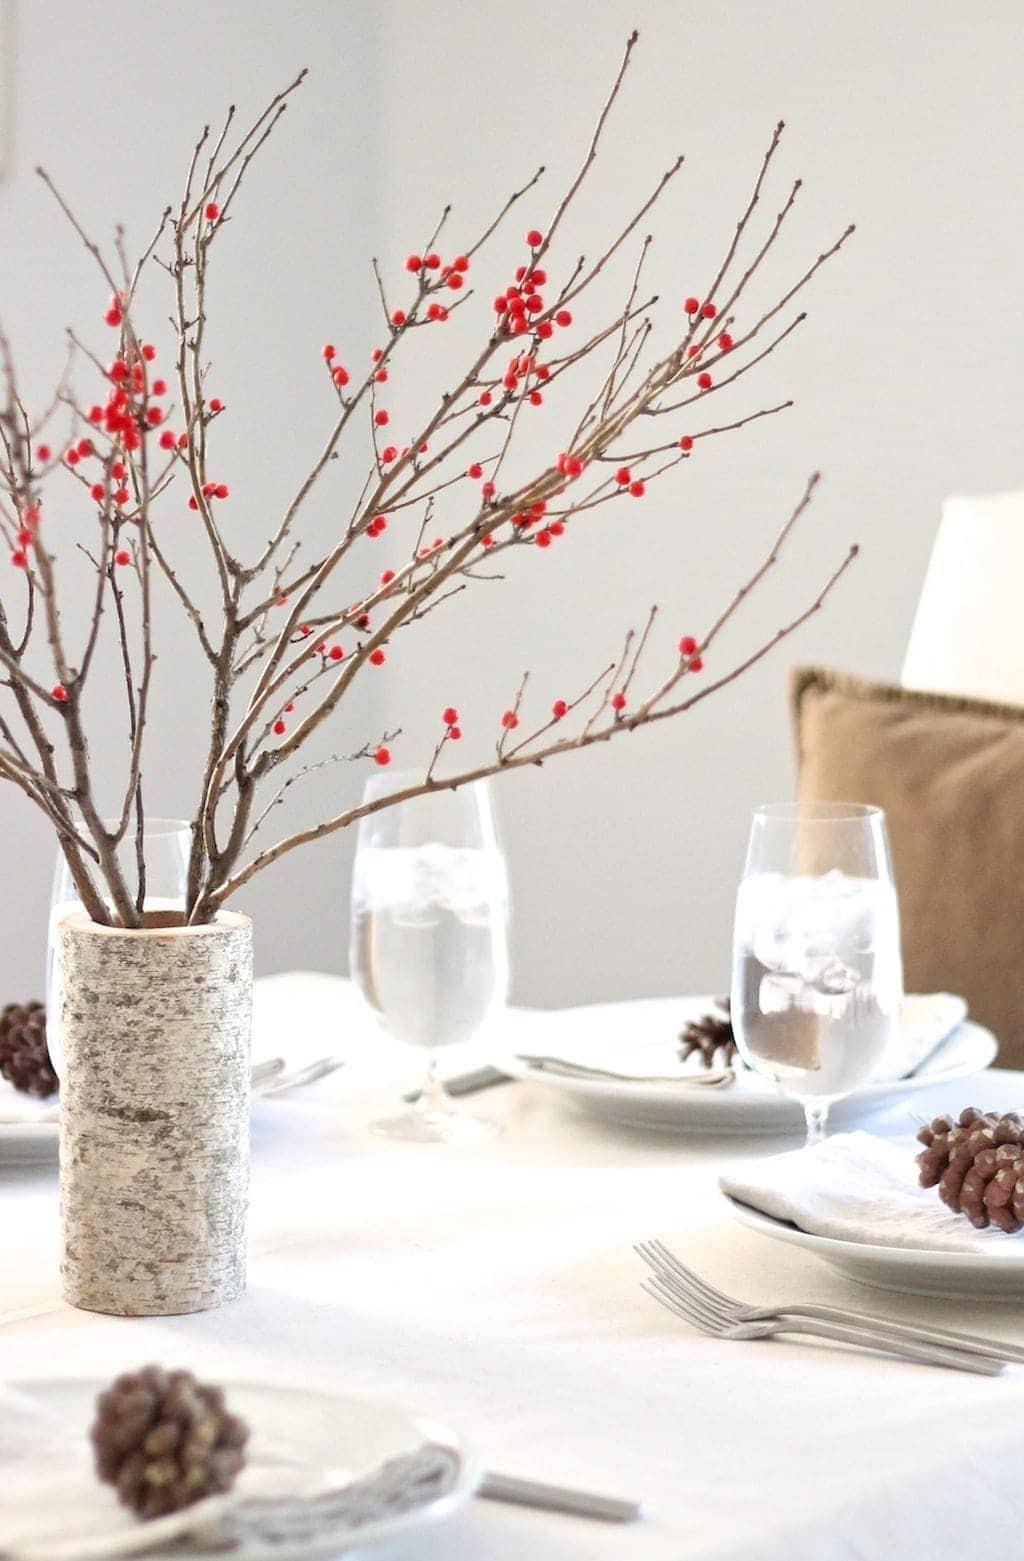 Berry Amp Birch Christmas Table Setting